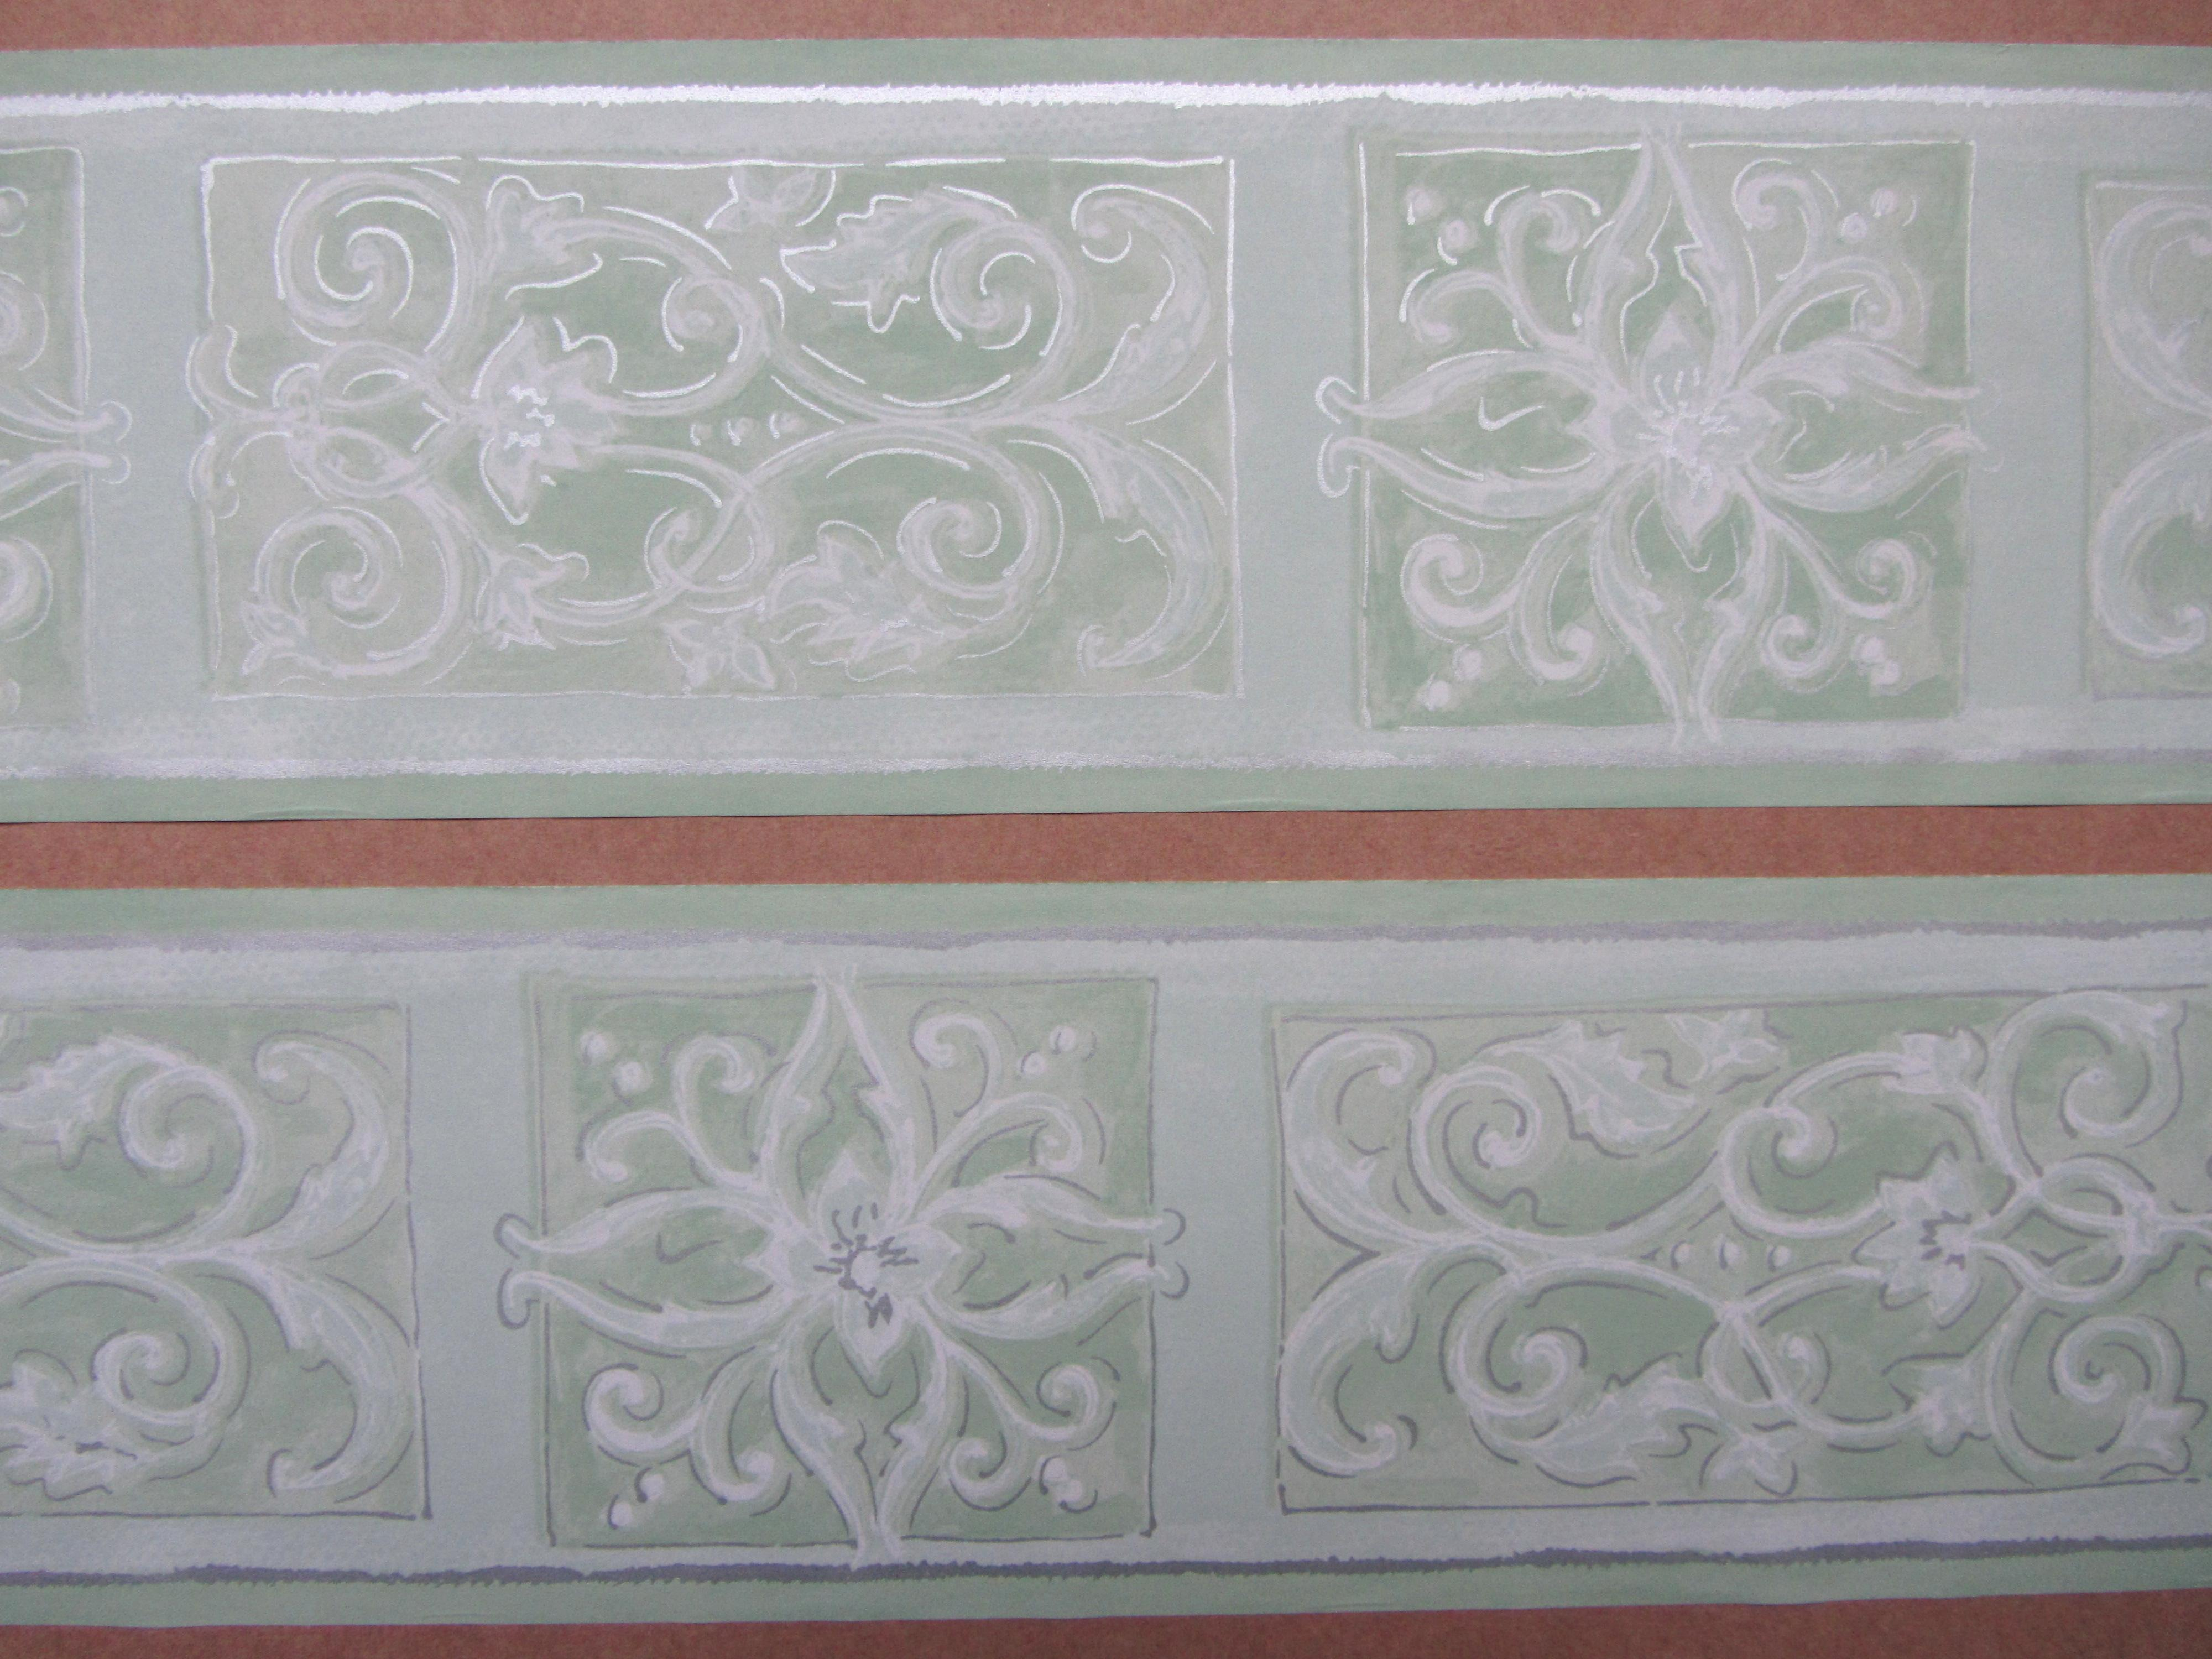 ORNATE SCROLL GREEN WALLPAPER BORDER SELF ADHESIVE BEDROOM